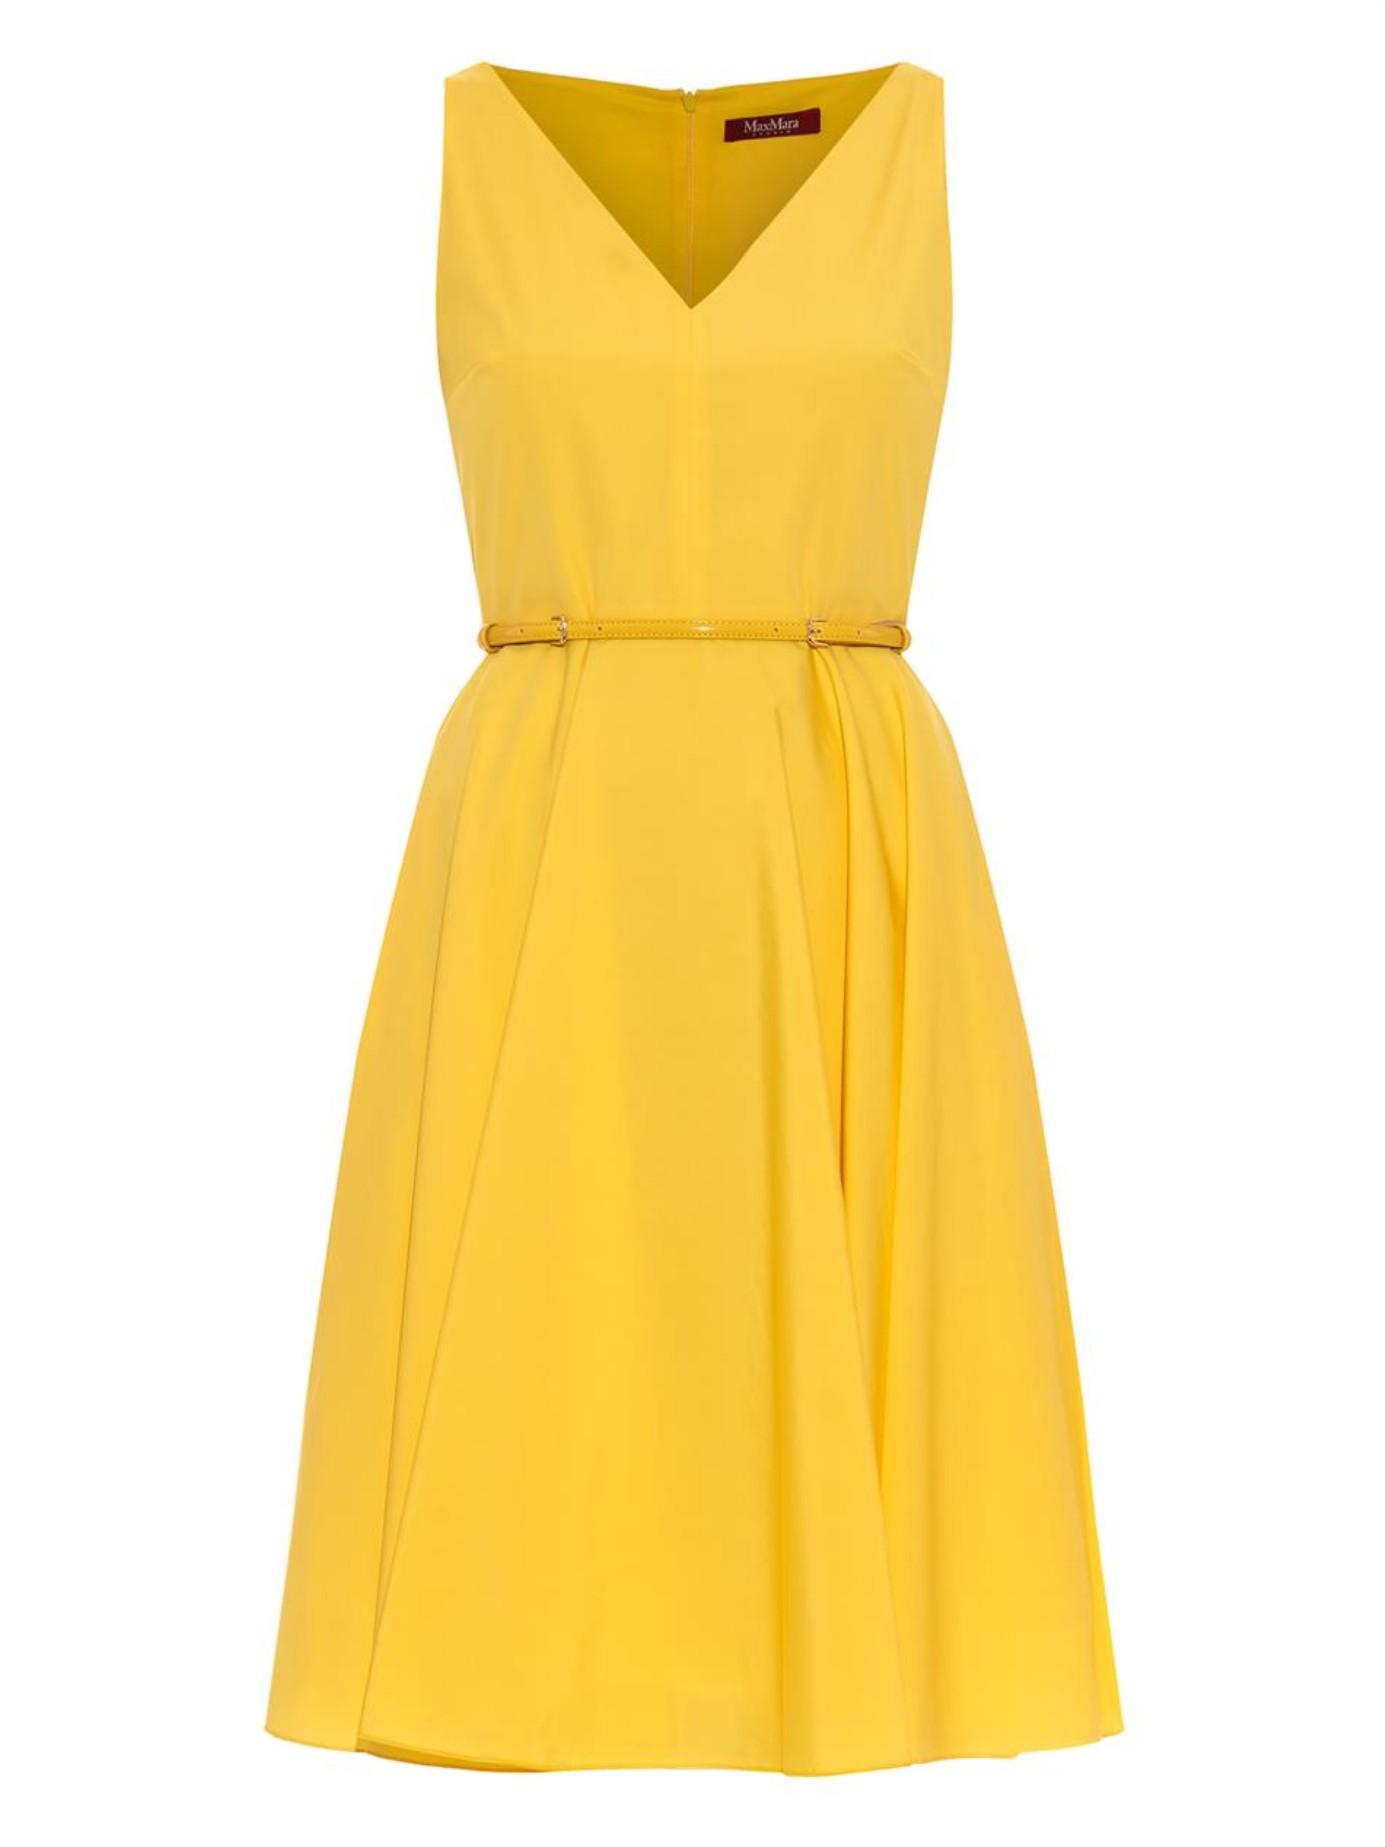 max mara studio asiago dress in yellow lyst. Black Bedroom Furniture Sets. Home Design Ideas